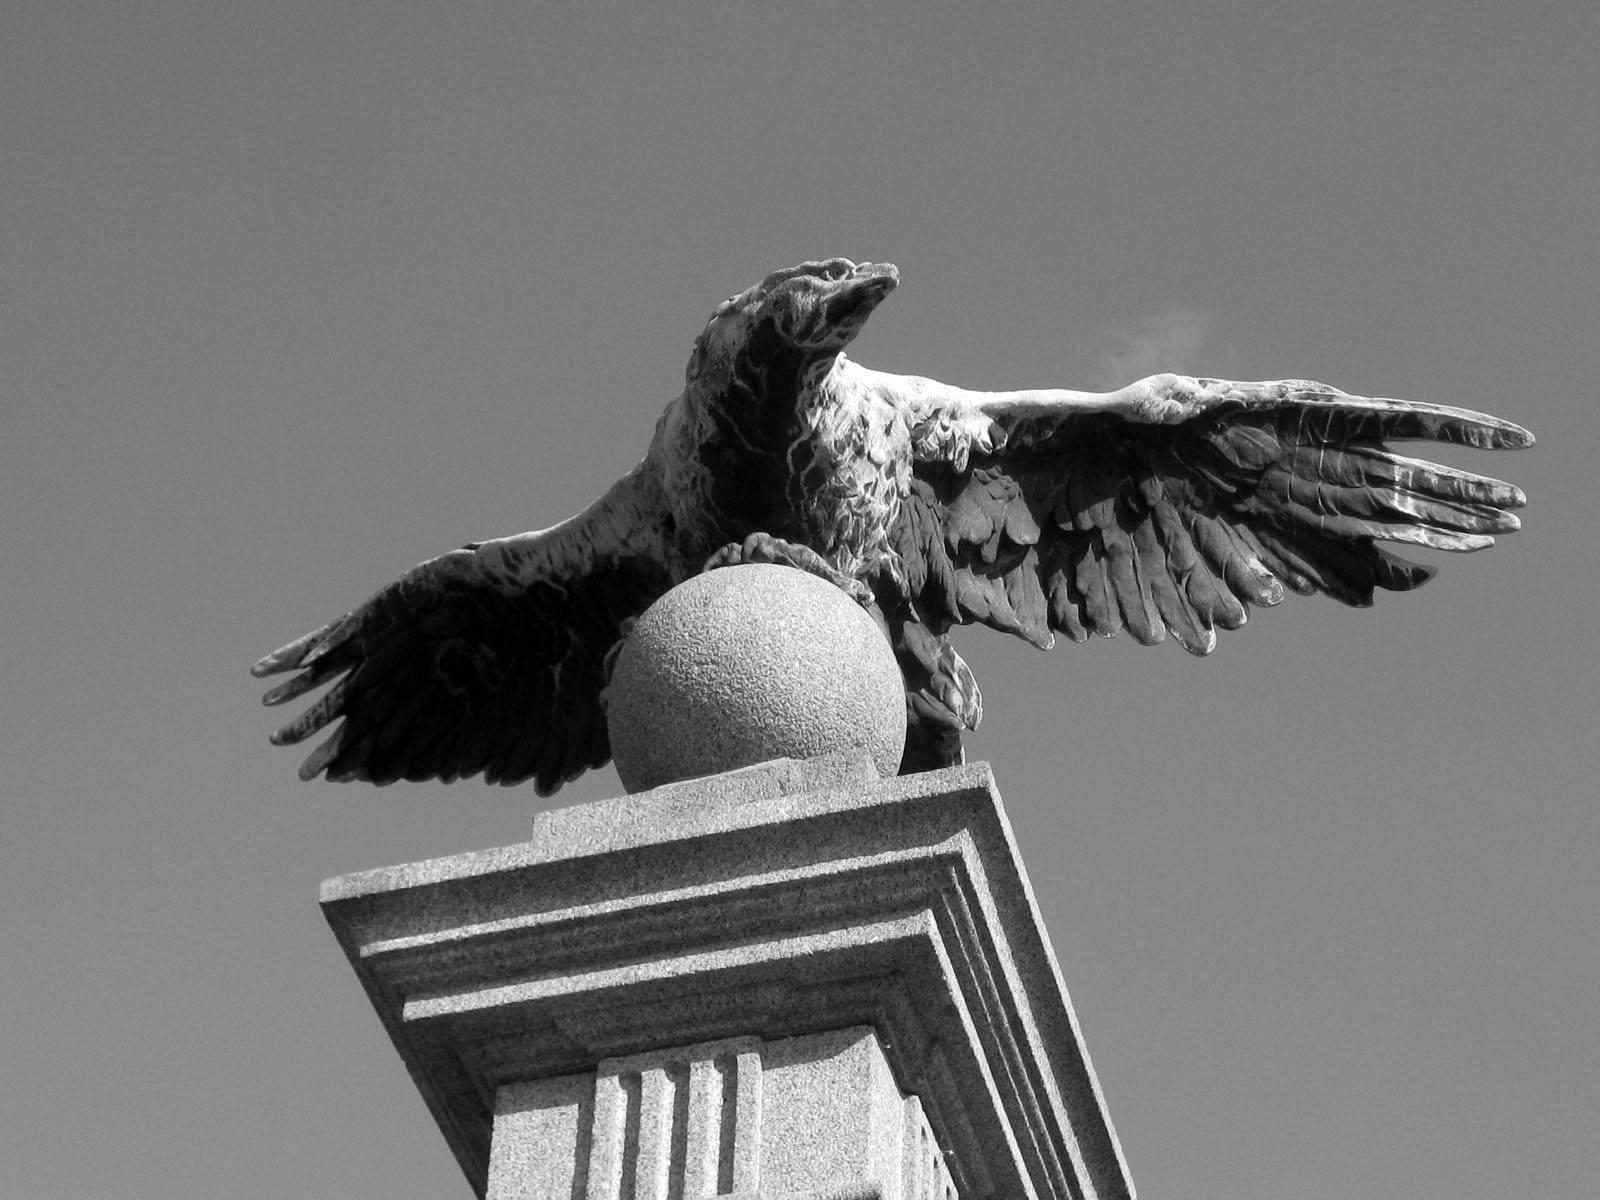 Eagles' Bridge, Sofia, Bulgaria